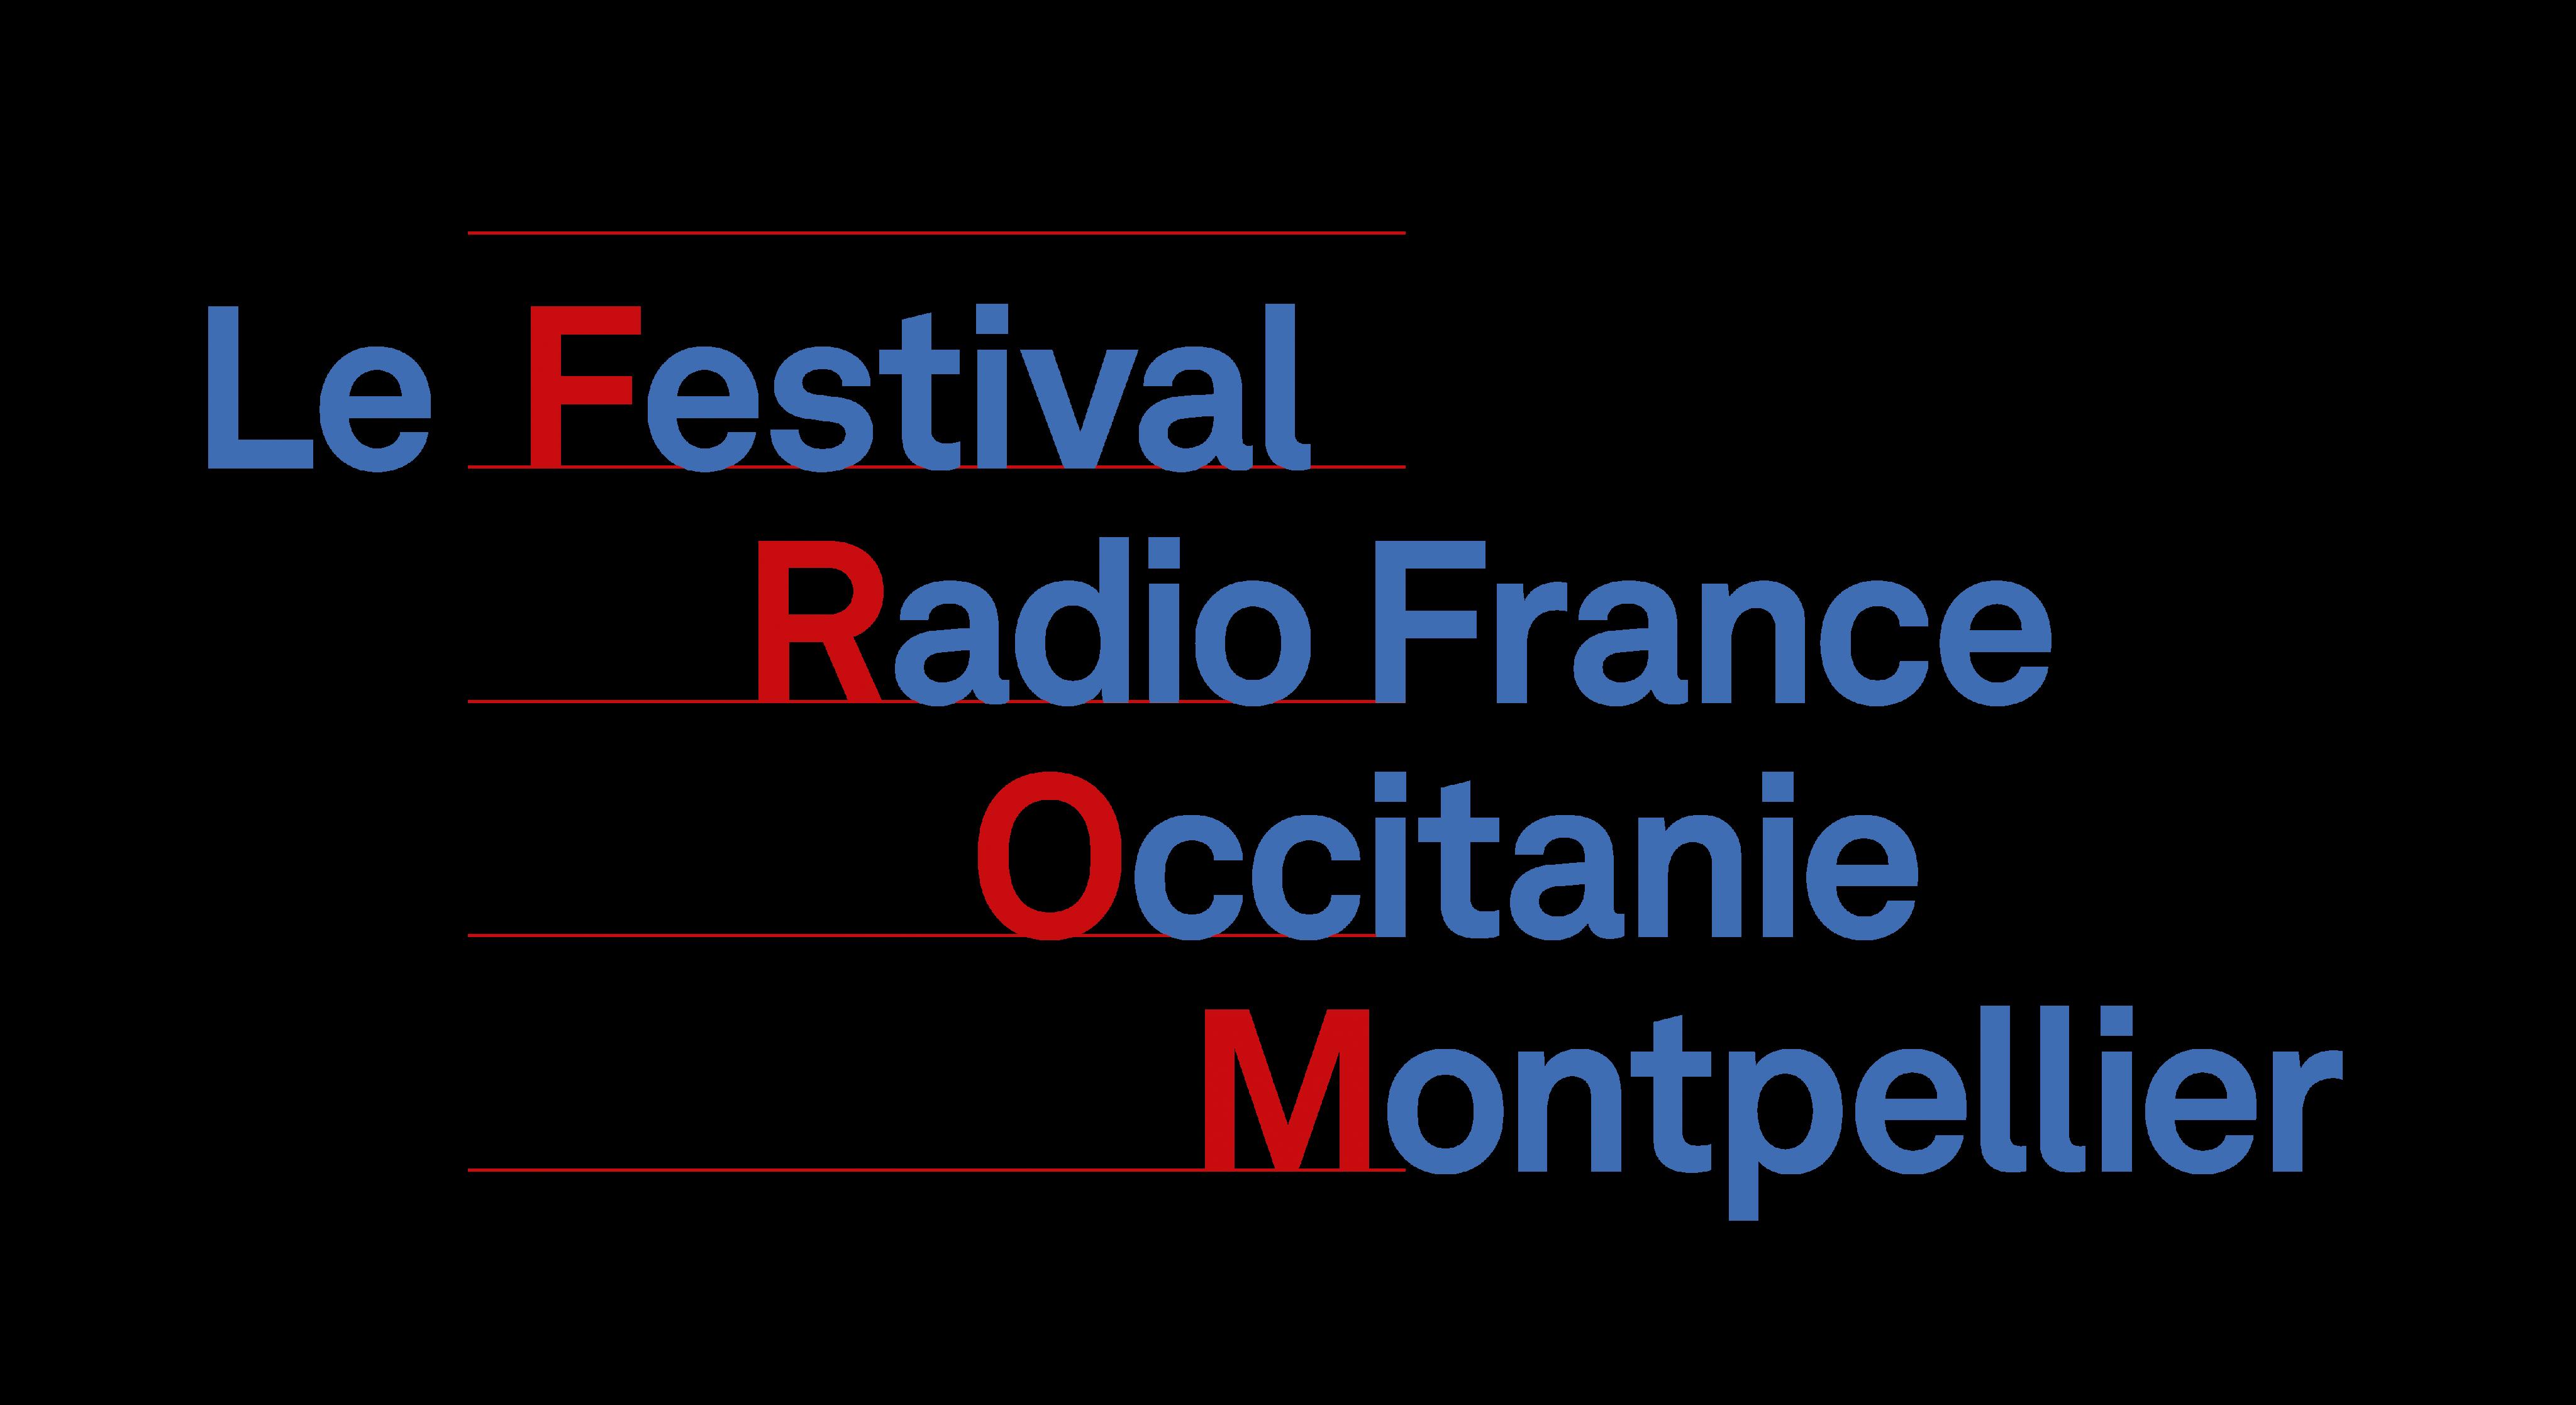 Le Festival Radio France Occitanie Montpellier